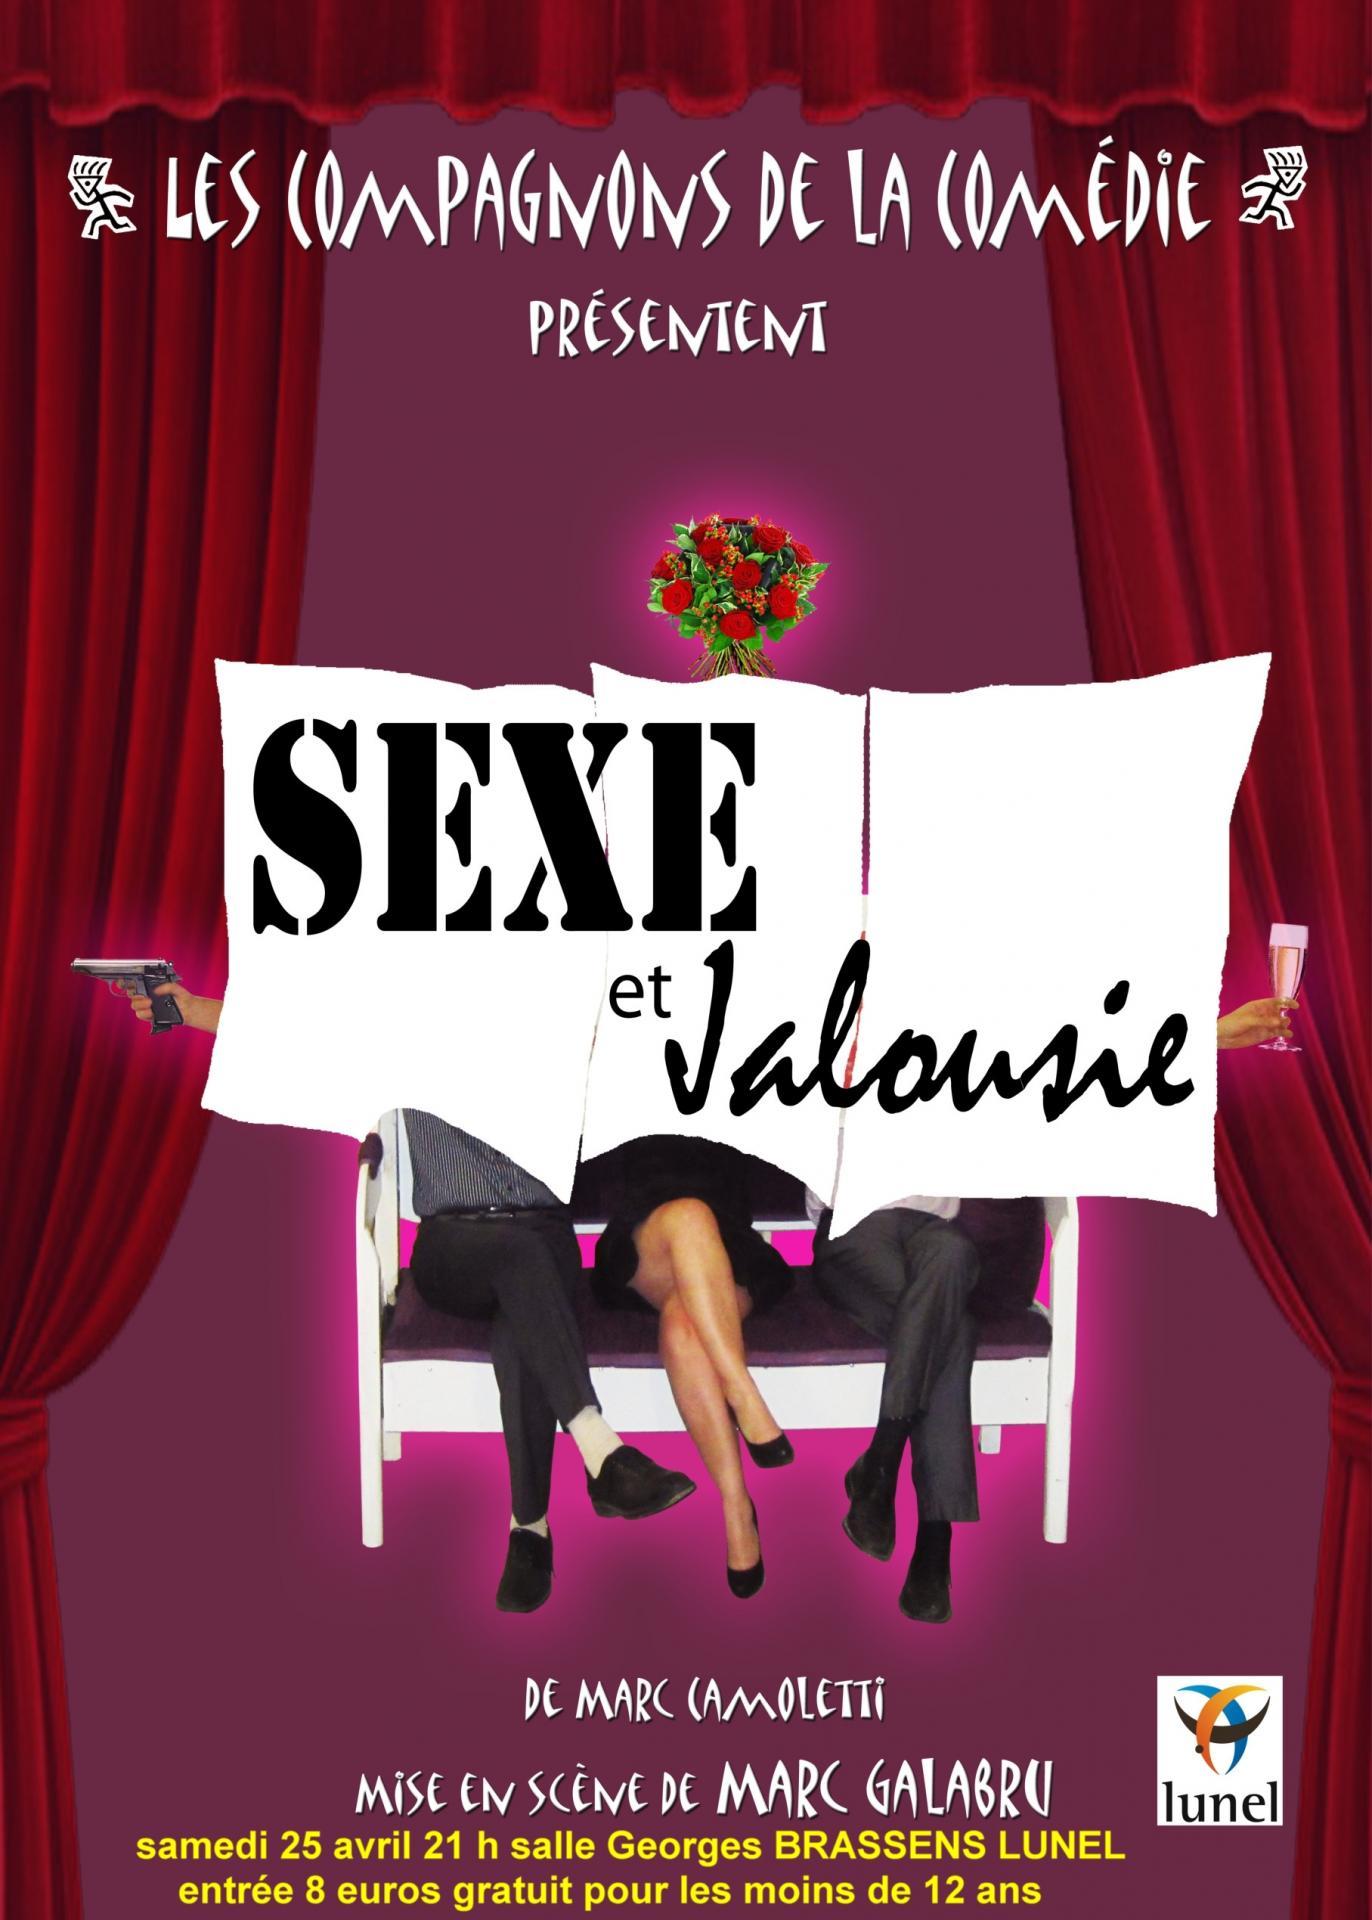 Sexe et jalousie 25 avril 2015 brassens